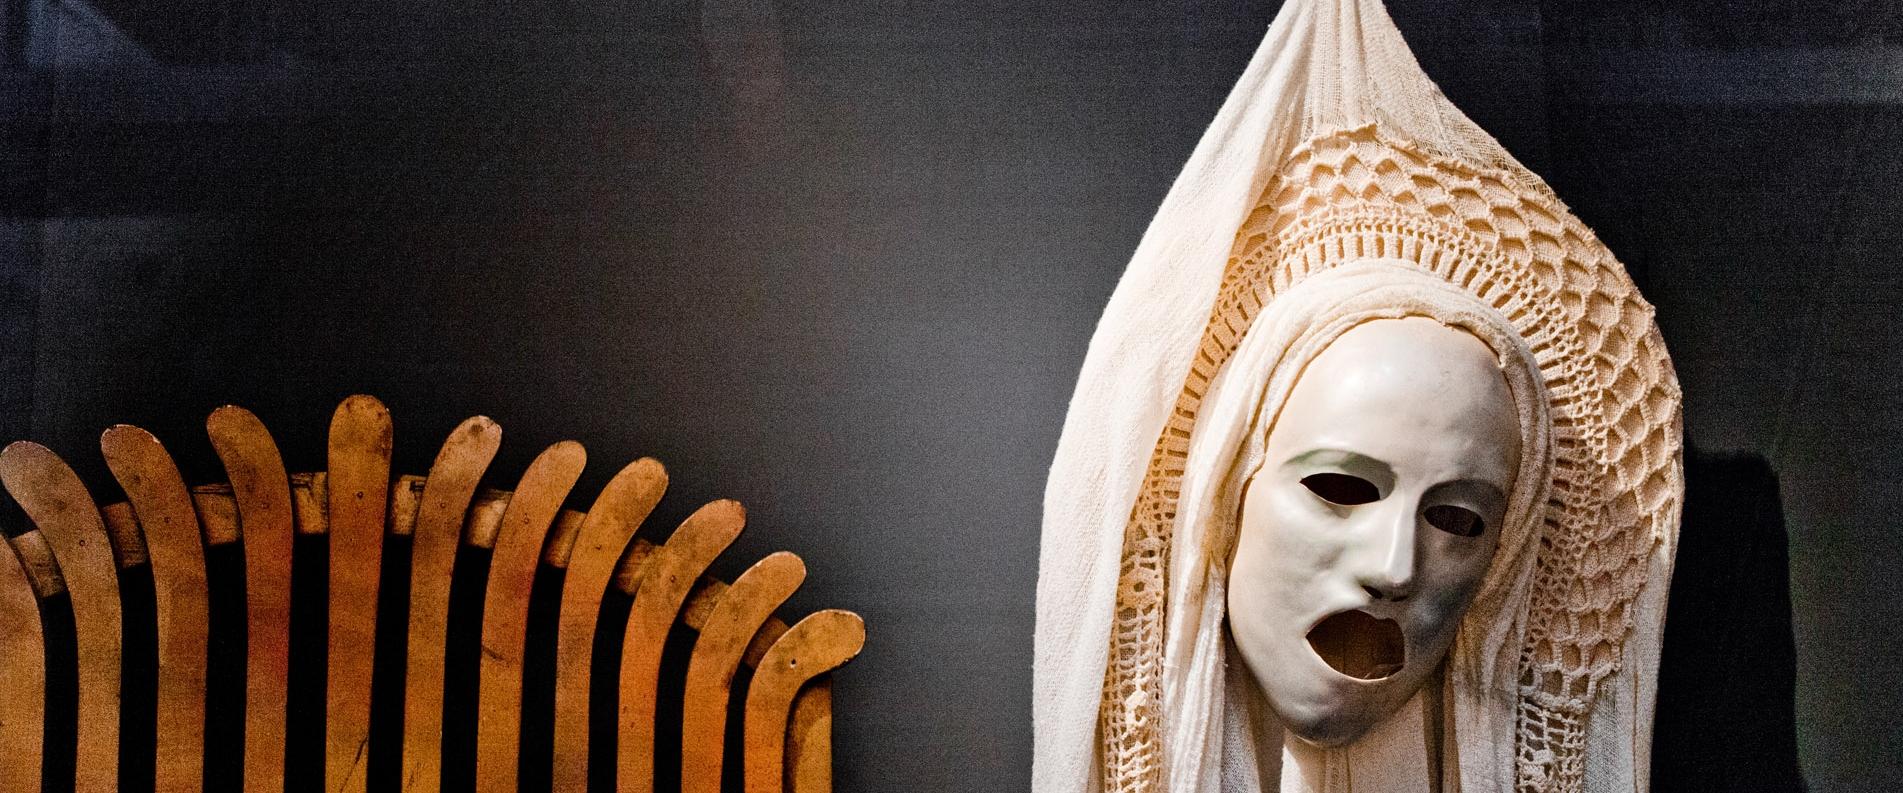 Музеи Лимассола: Его Величество Театр